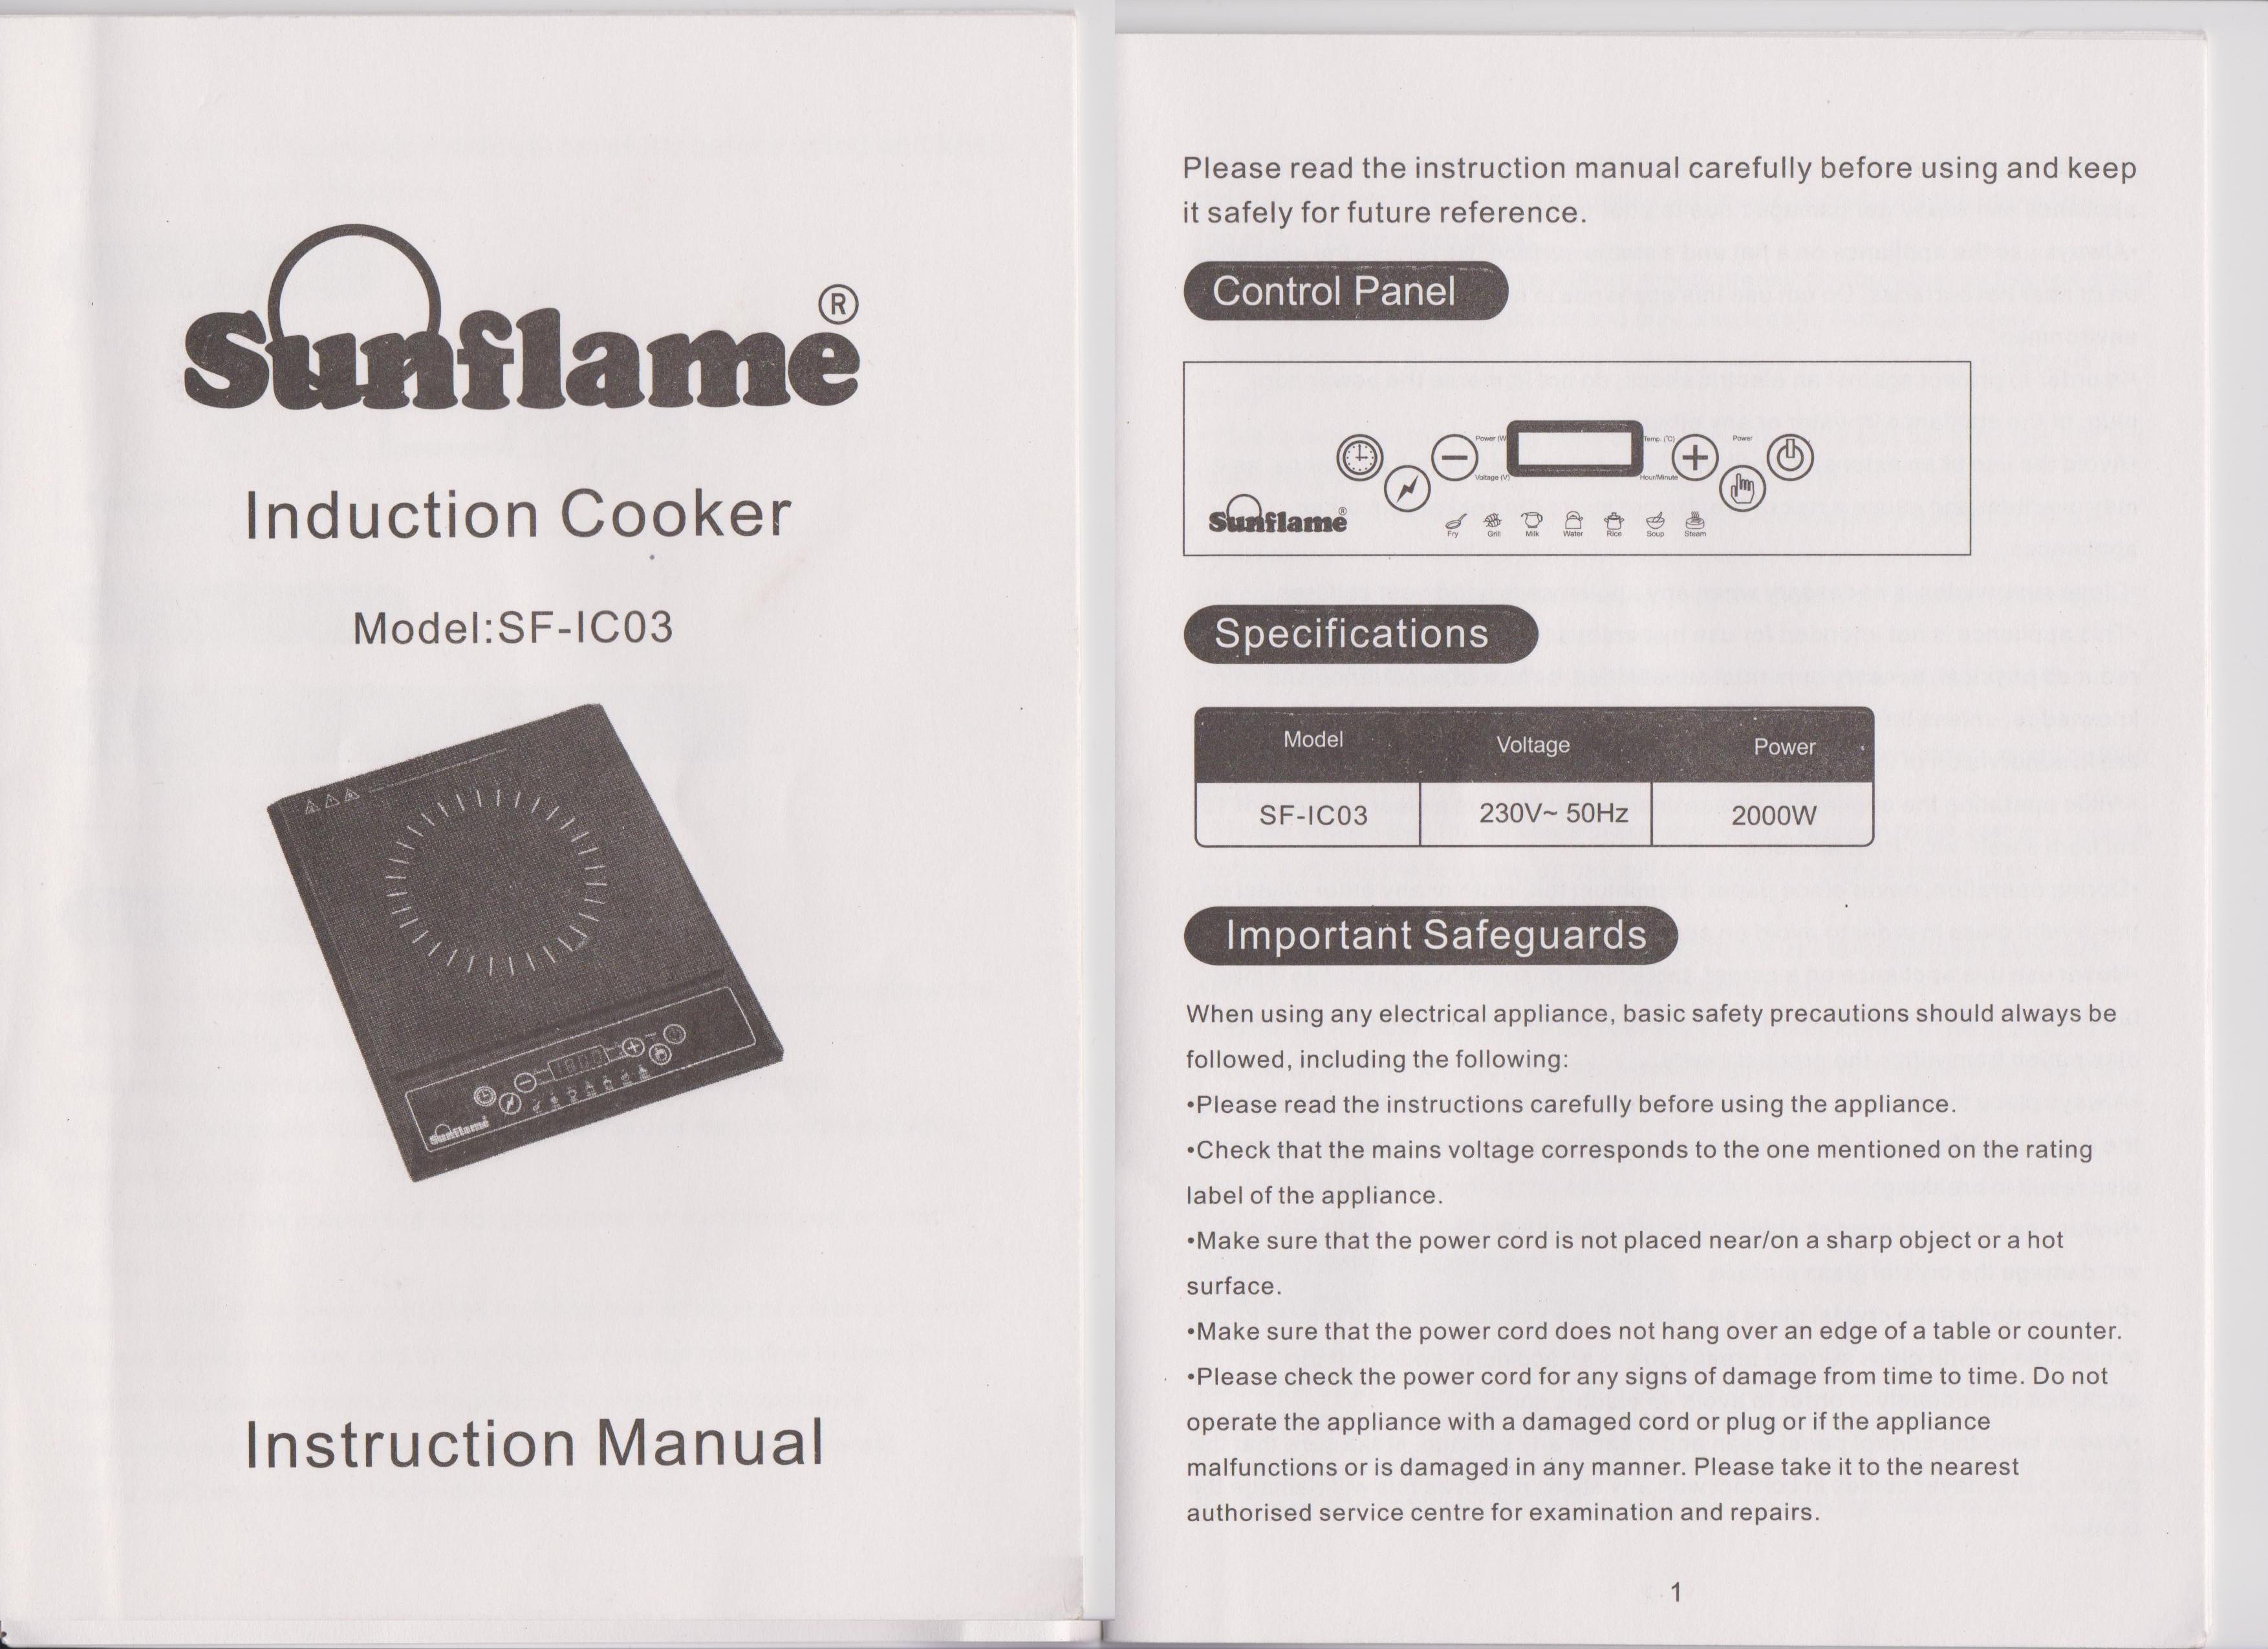 kelvinator oven instruction manual